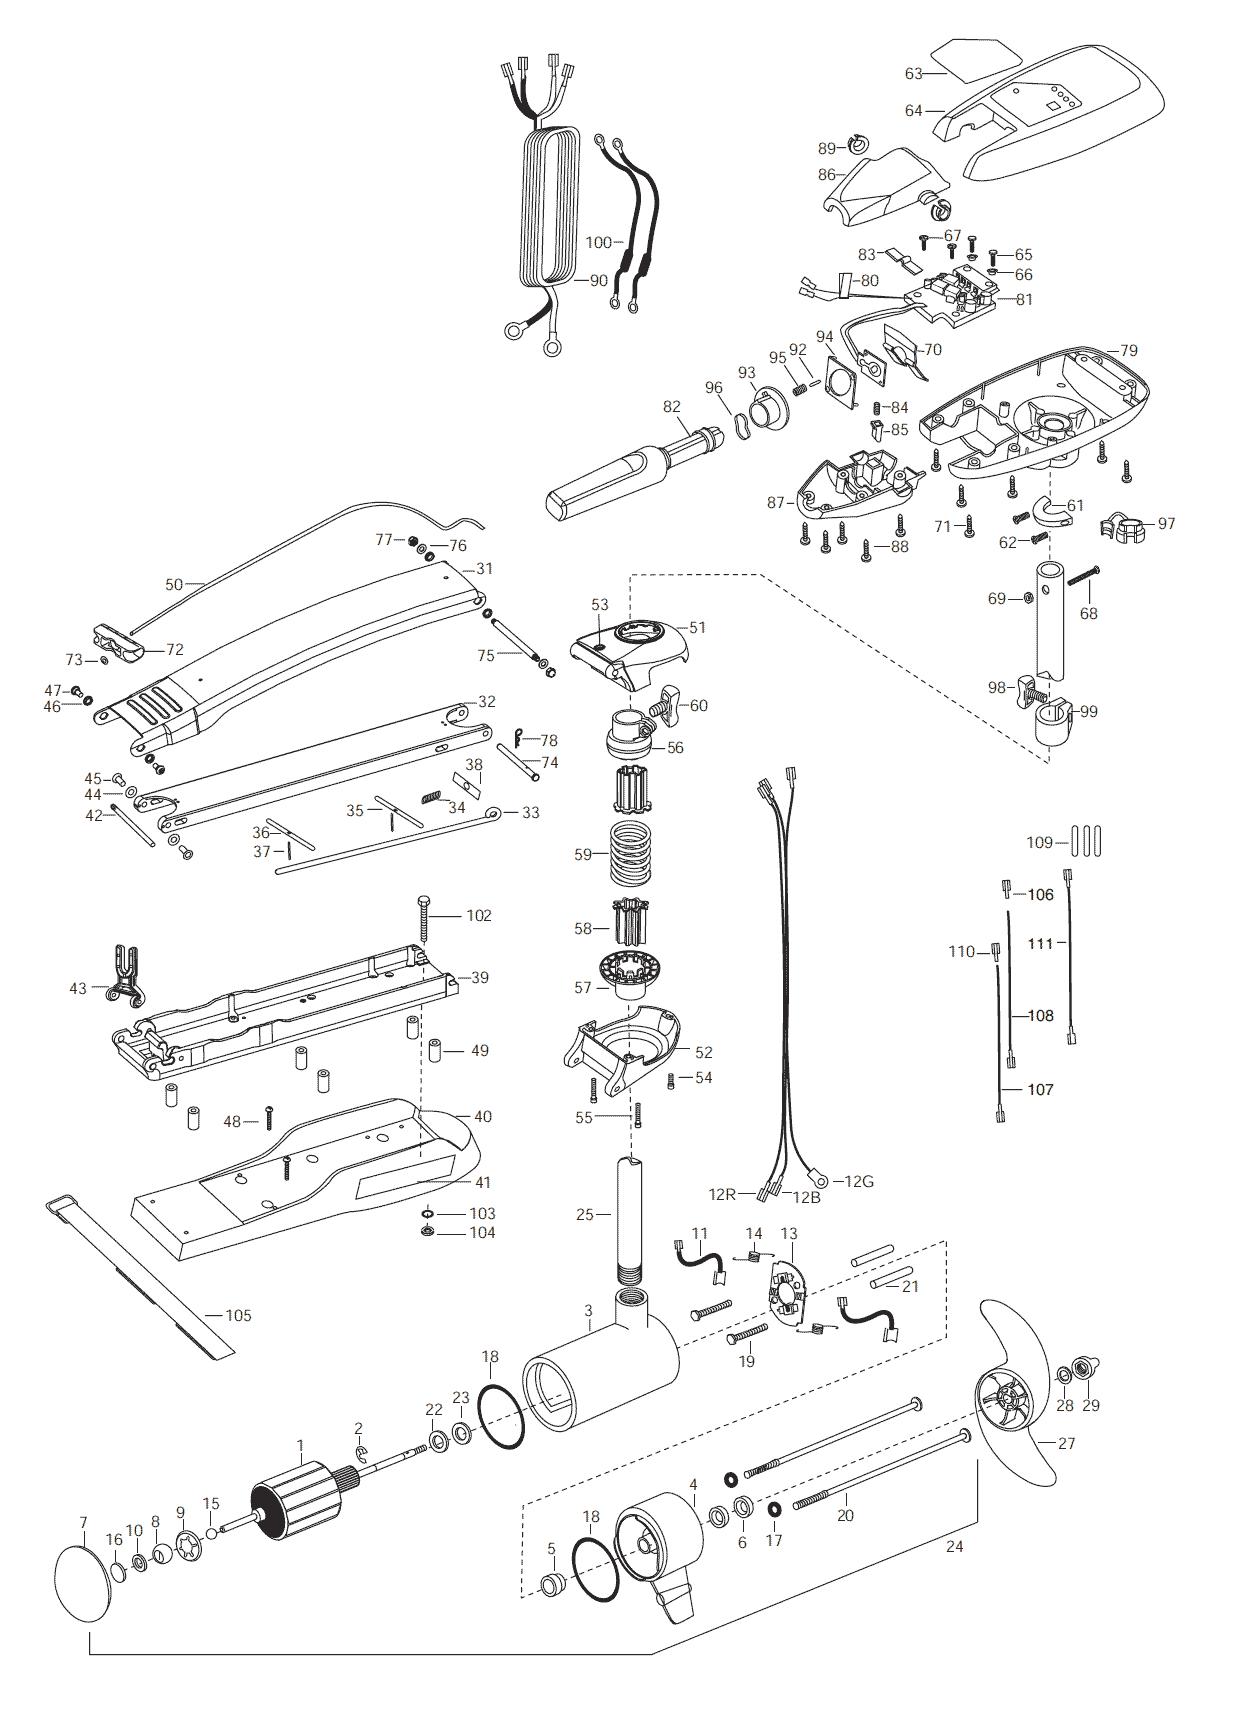 minn kota fortrex 80 parts diagram strip light wiring riptide 101 52 inch 2003 from fish307